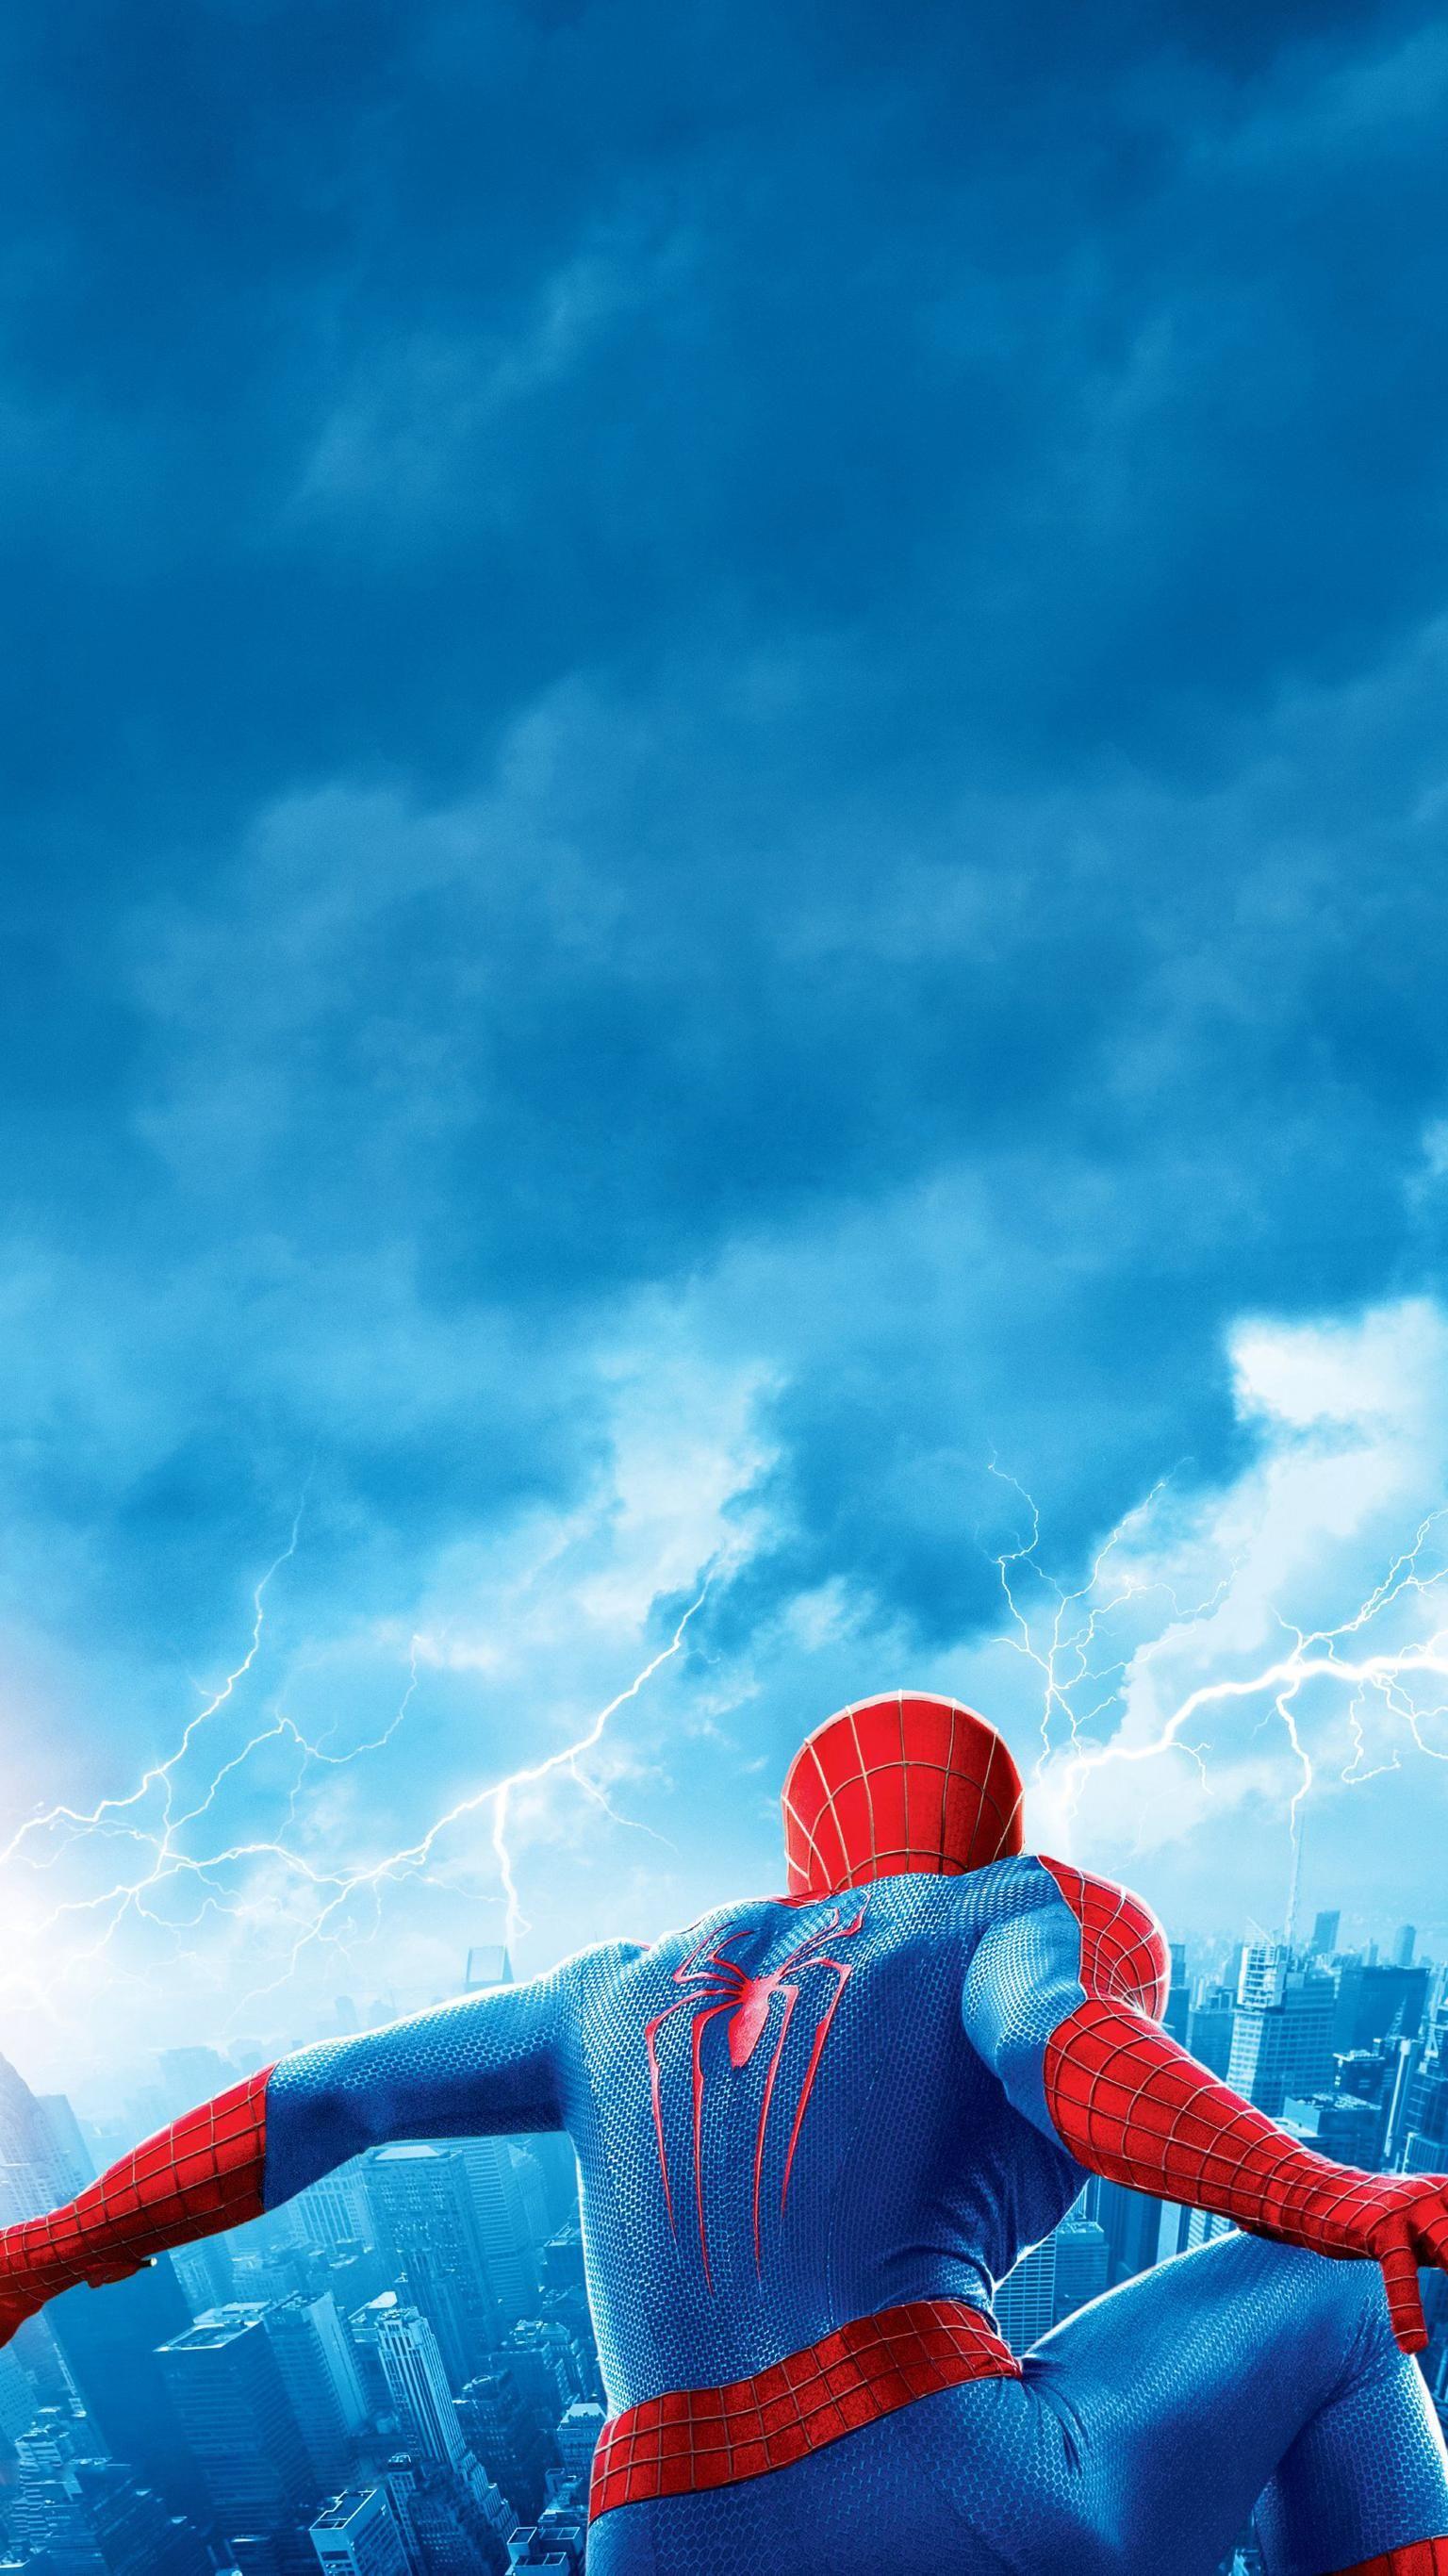 The Amazing Spider Man 2 2014 Phone Wallpaper Moviemania Marvel Spiderman Art Amazing Spiderman Amazing Spider The amazing spider man 2 wallpaper for